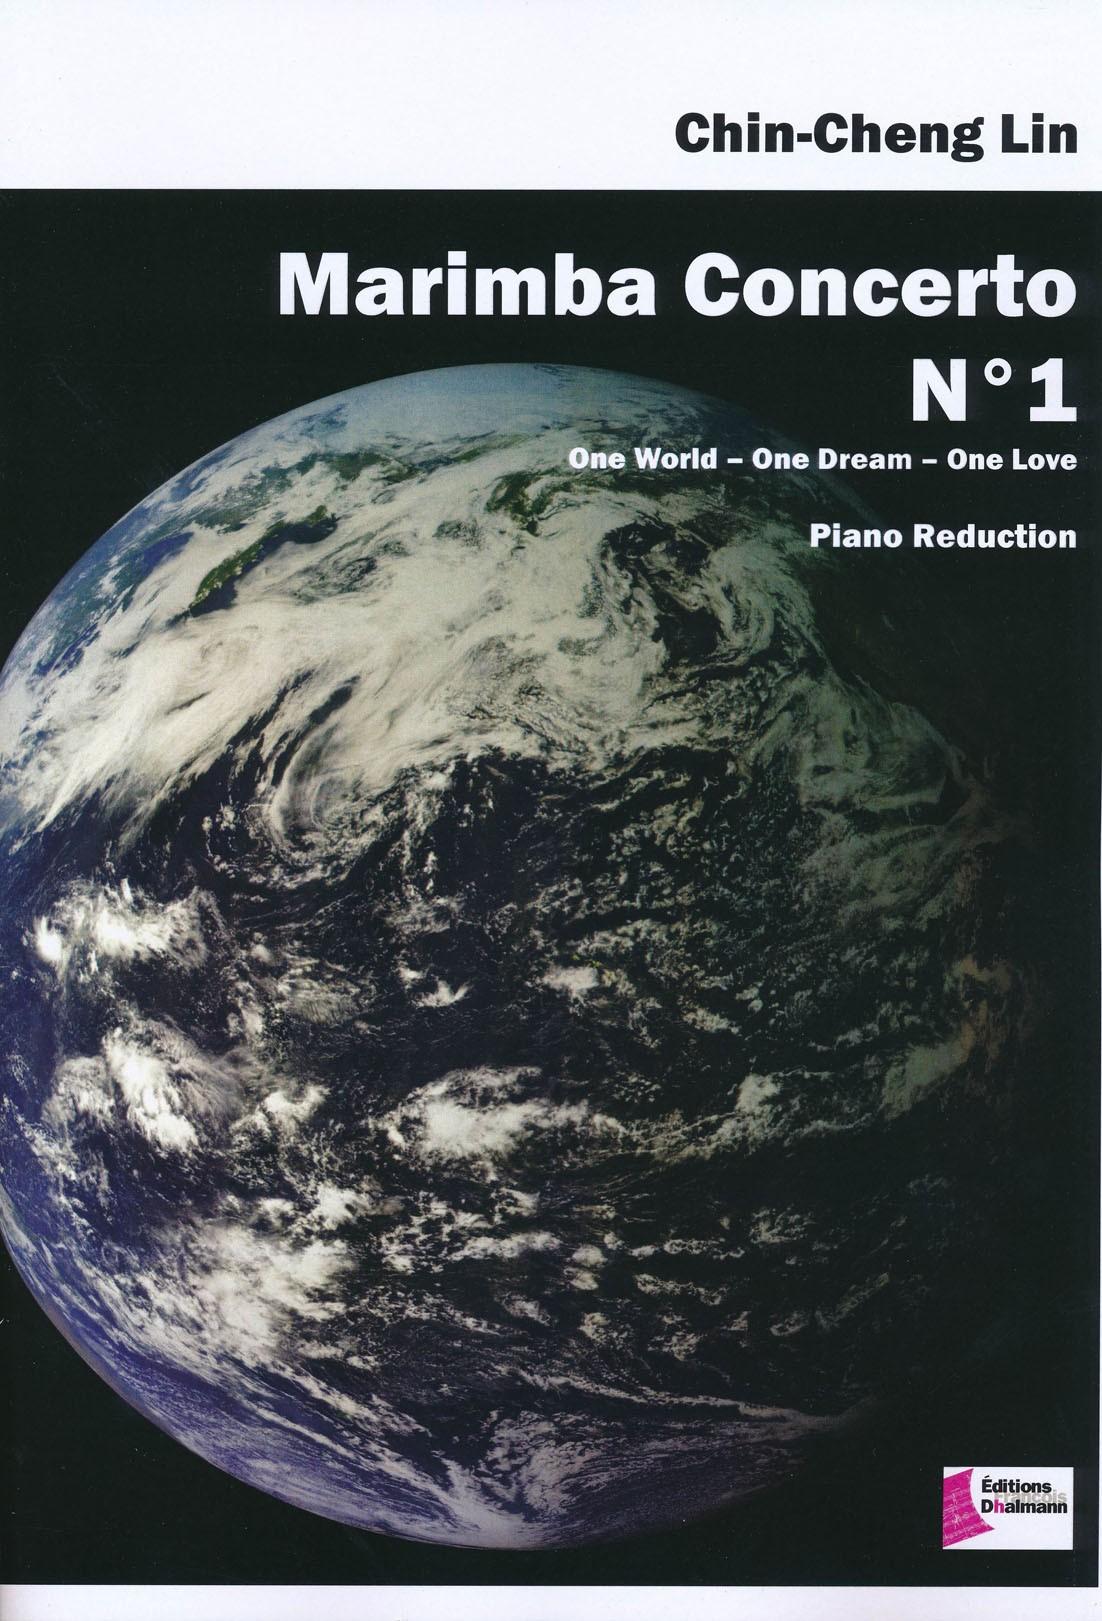 Marimba Concerto no. 1 (piano reduction)